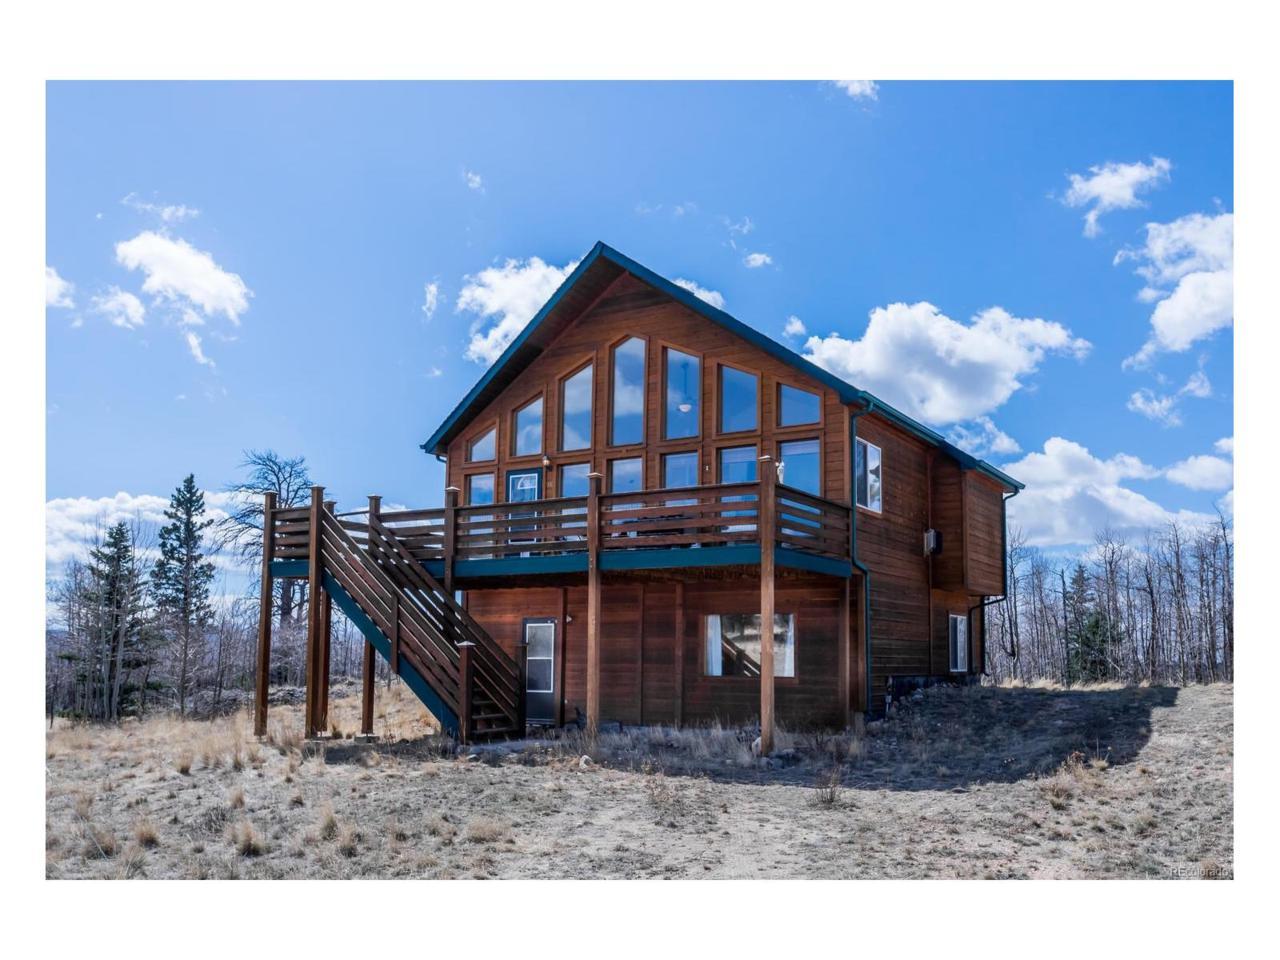 38 Ute Trail, Jefferson, CO 80456 (MLS #5024615) :: 8z Real Estate